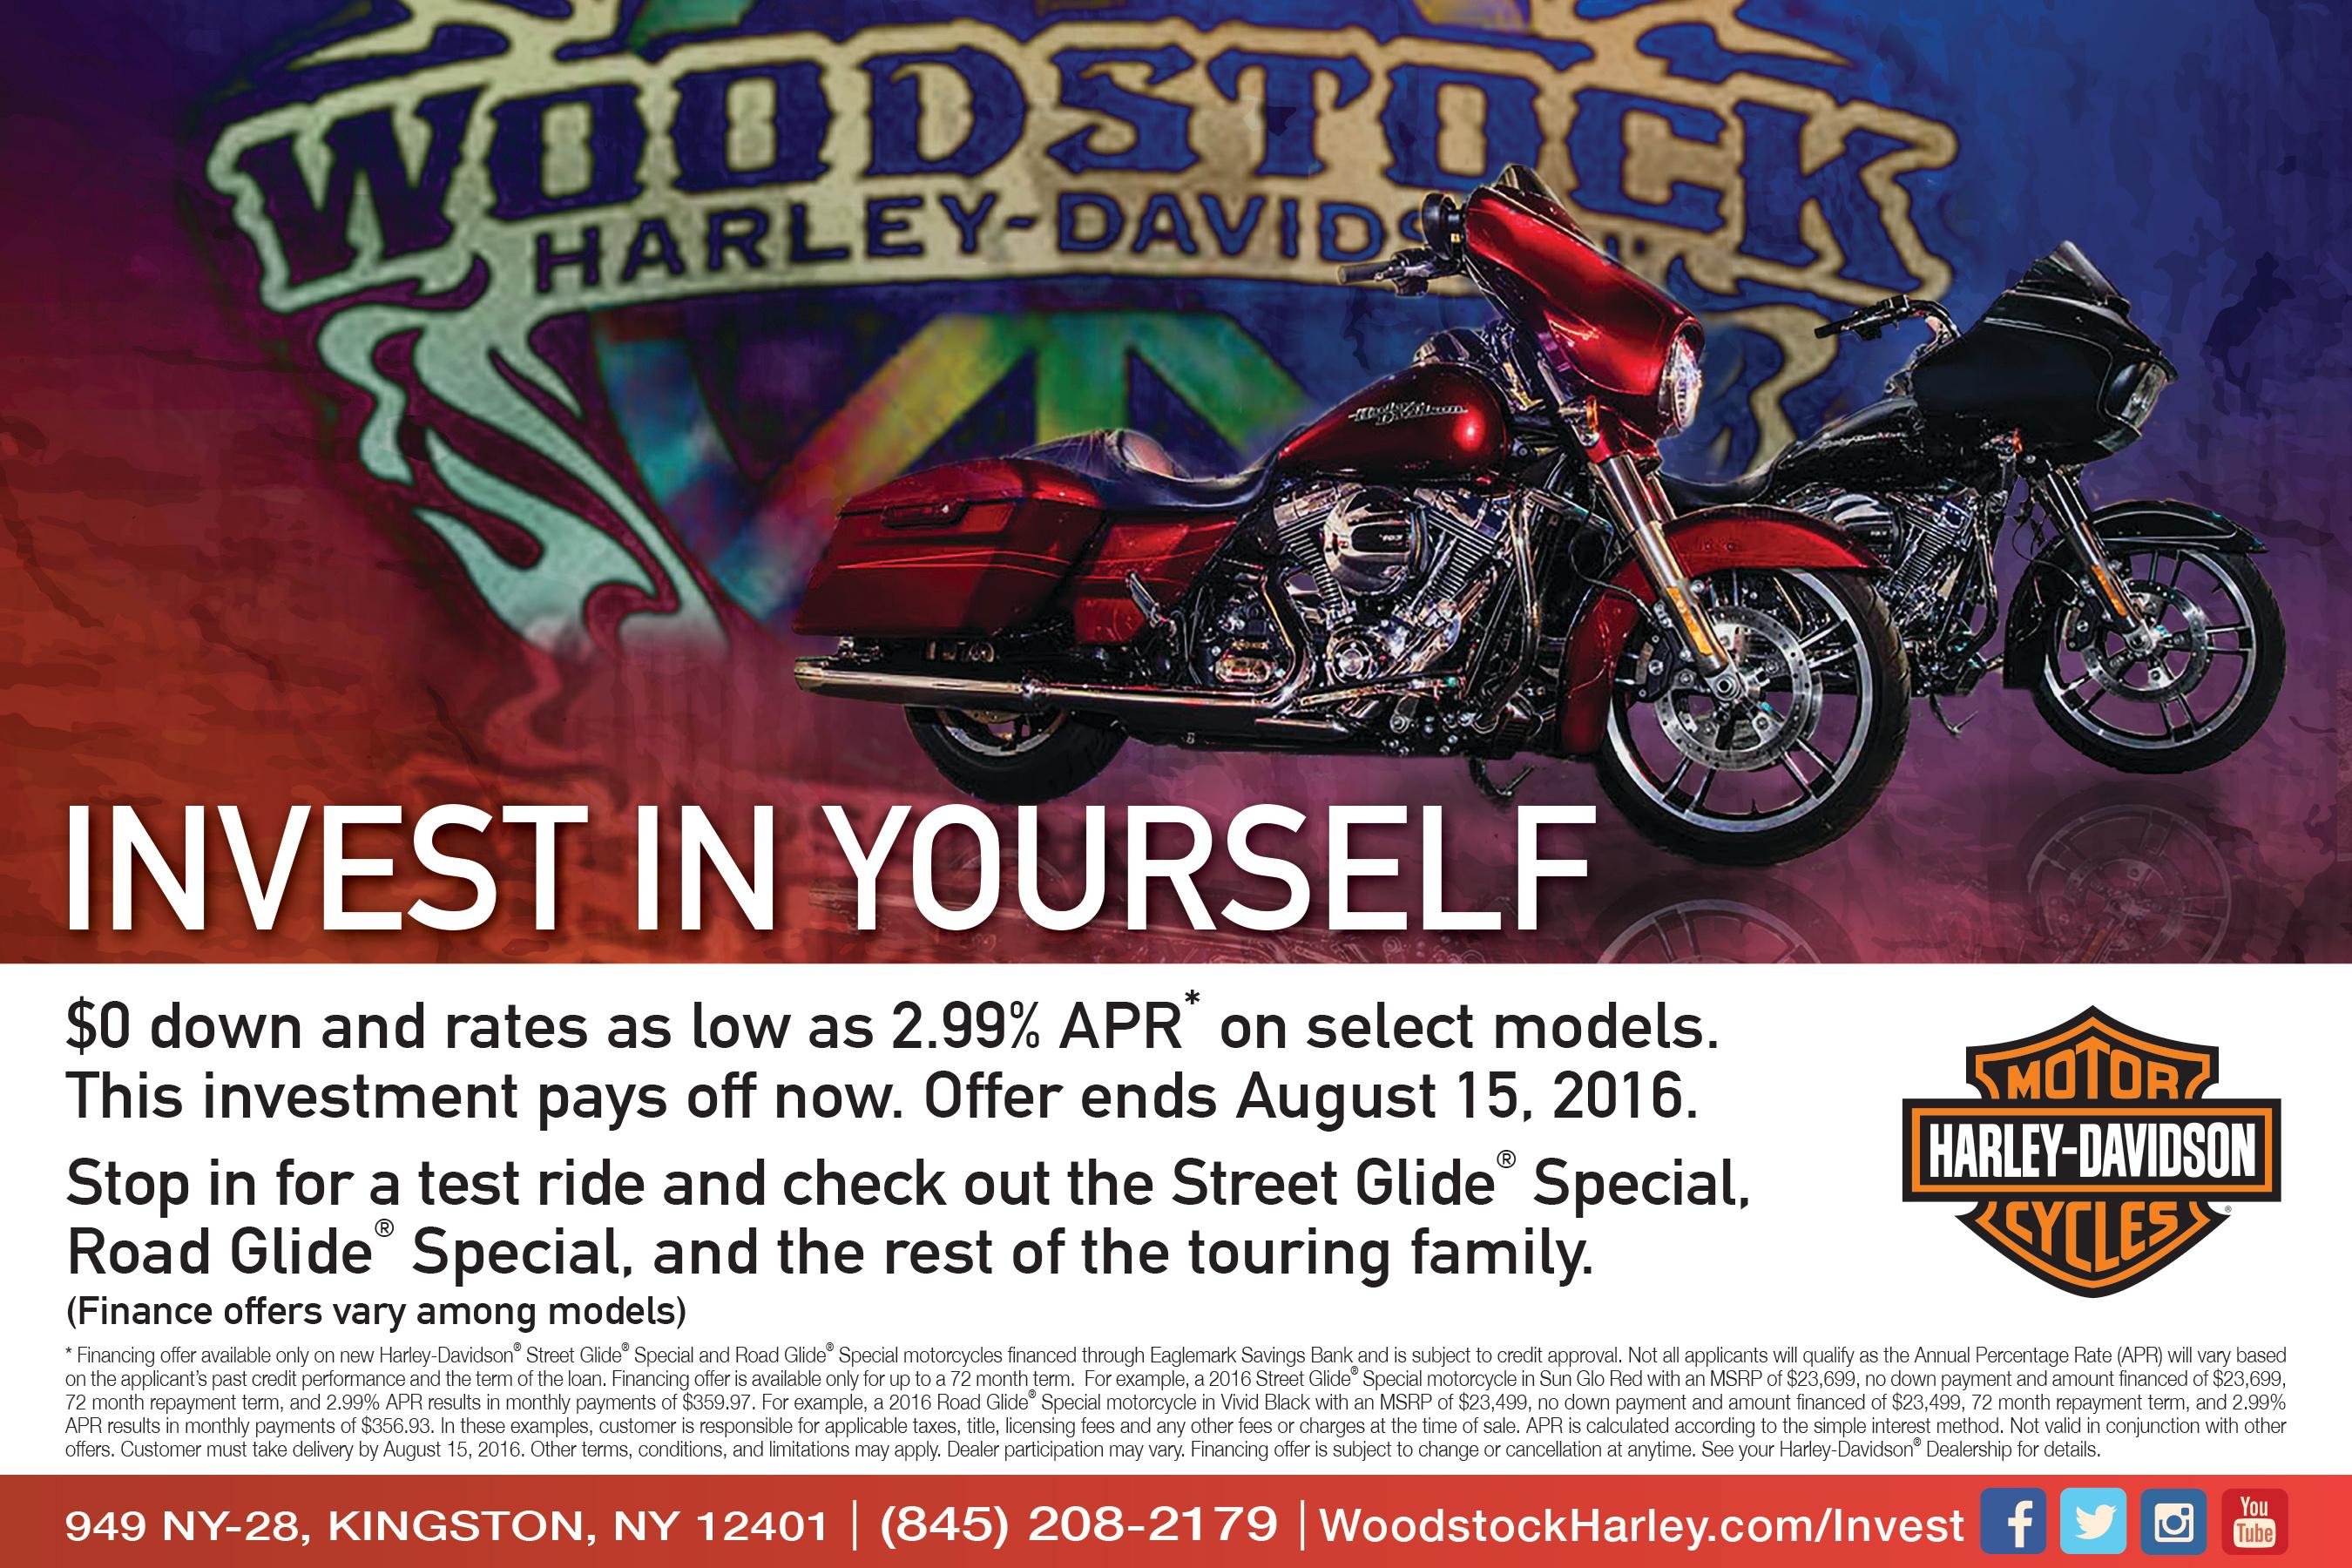 Woodstock Harley Ad